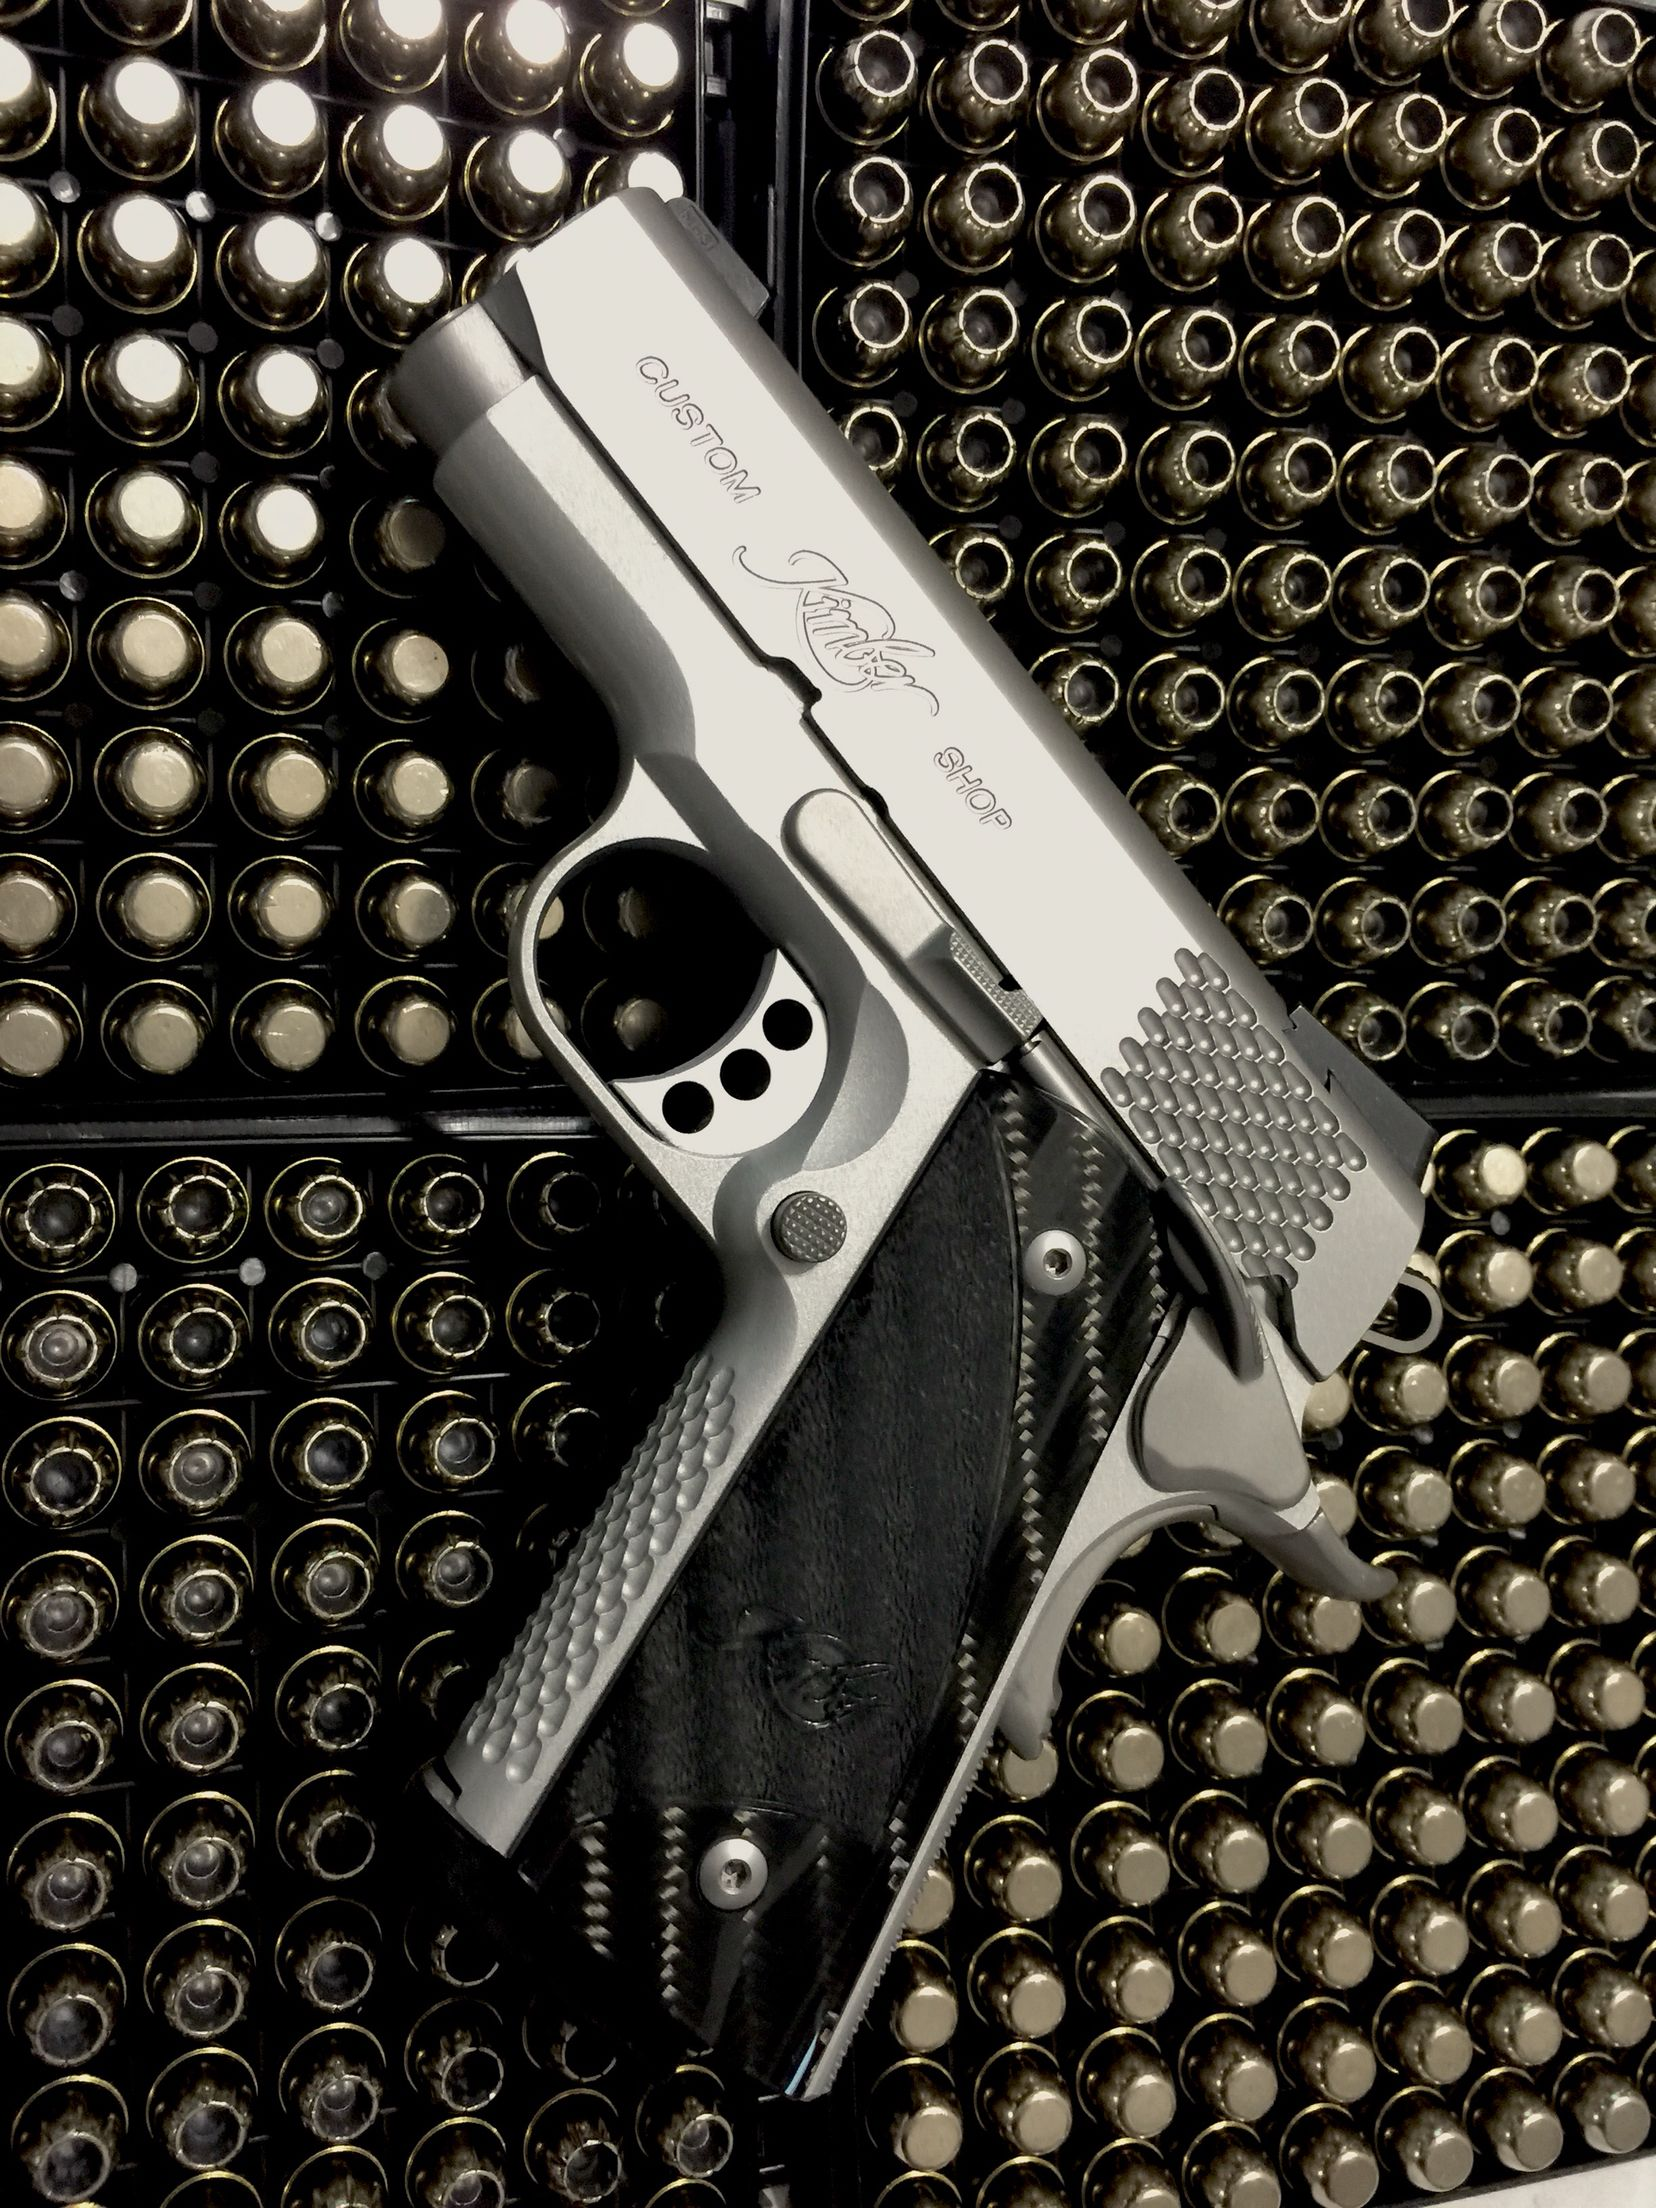 Kimber ultra raptor 2 Guns 45 cal 1911 stainless